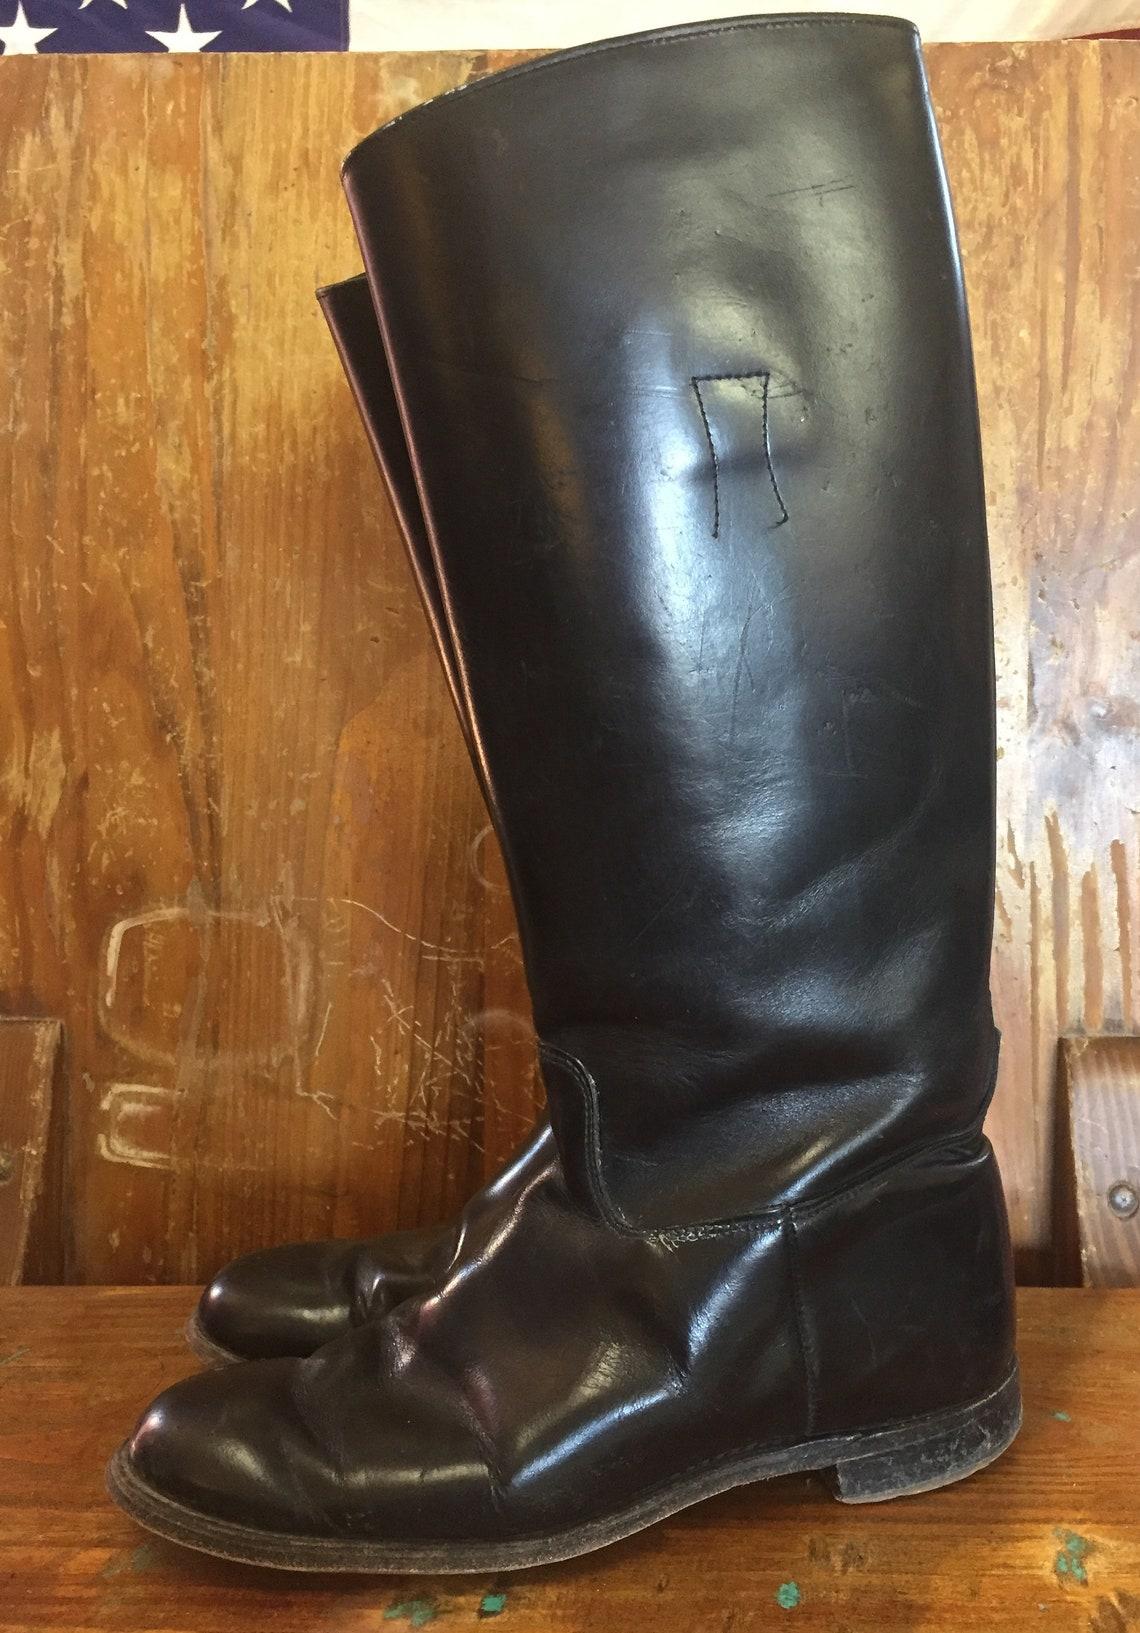 Ladies Vintage Black Equestrian Western Riding Boots Size 7c - Big Sale WhJ5x